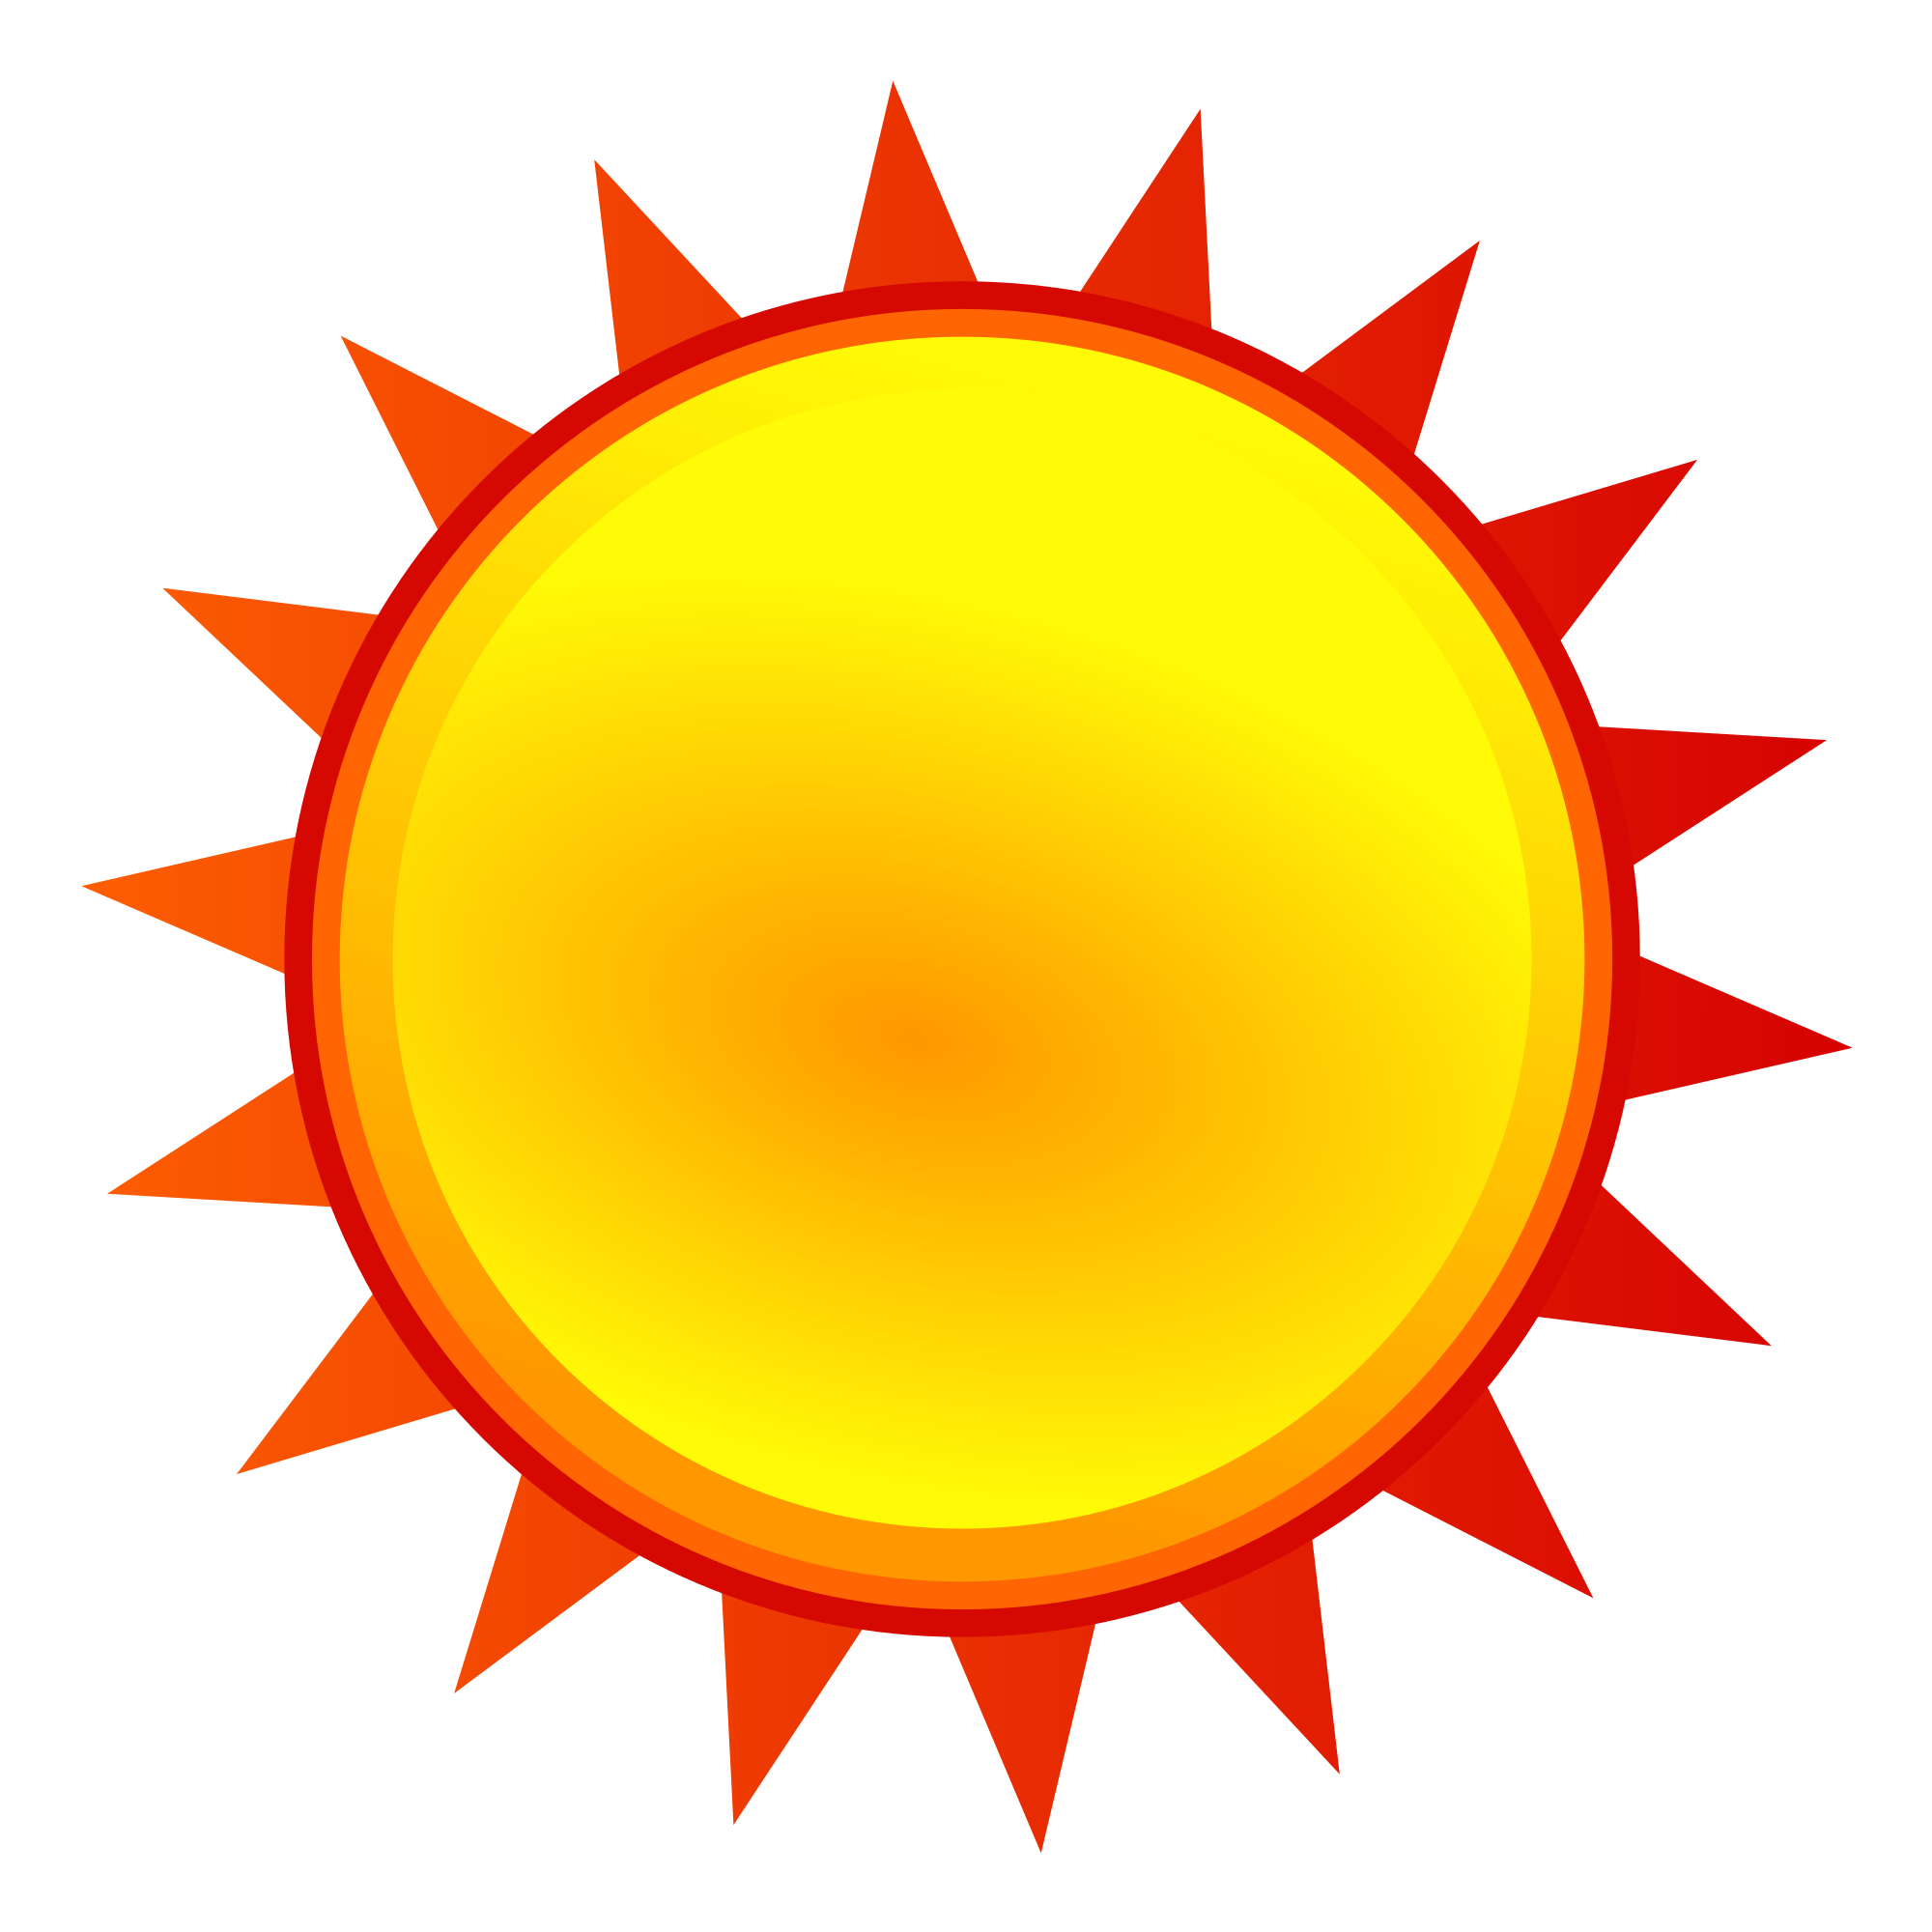 sunny clipart yellow #144777830